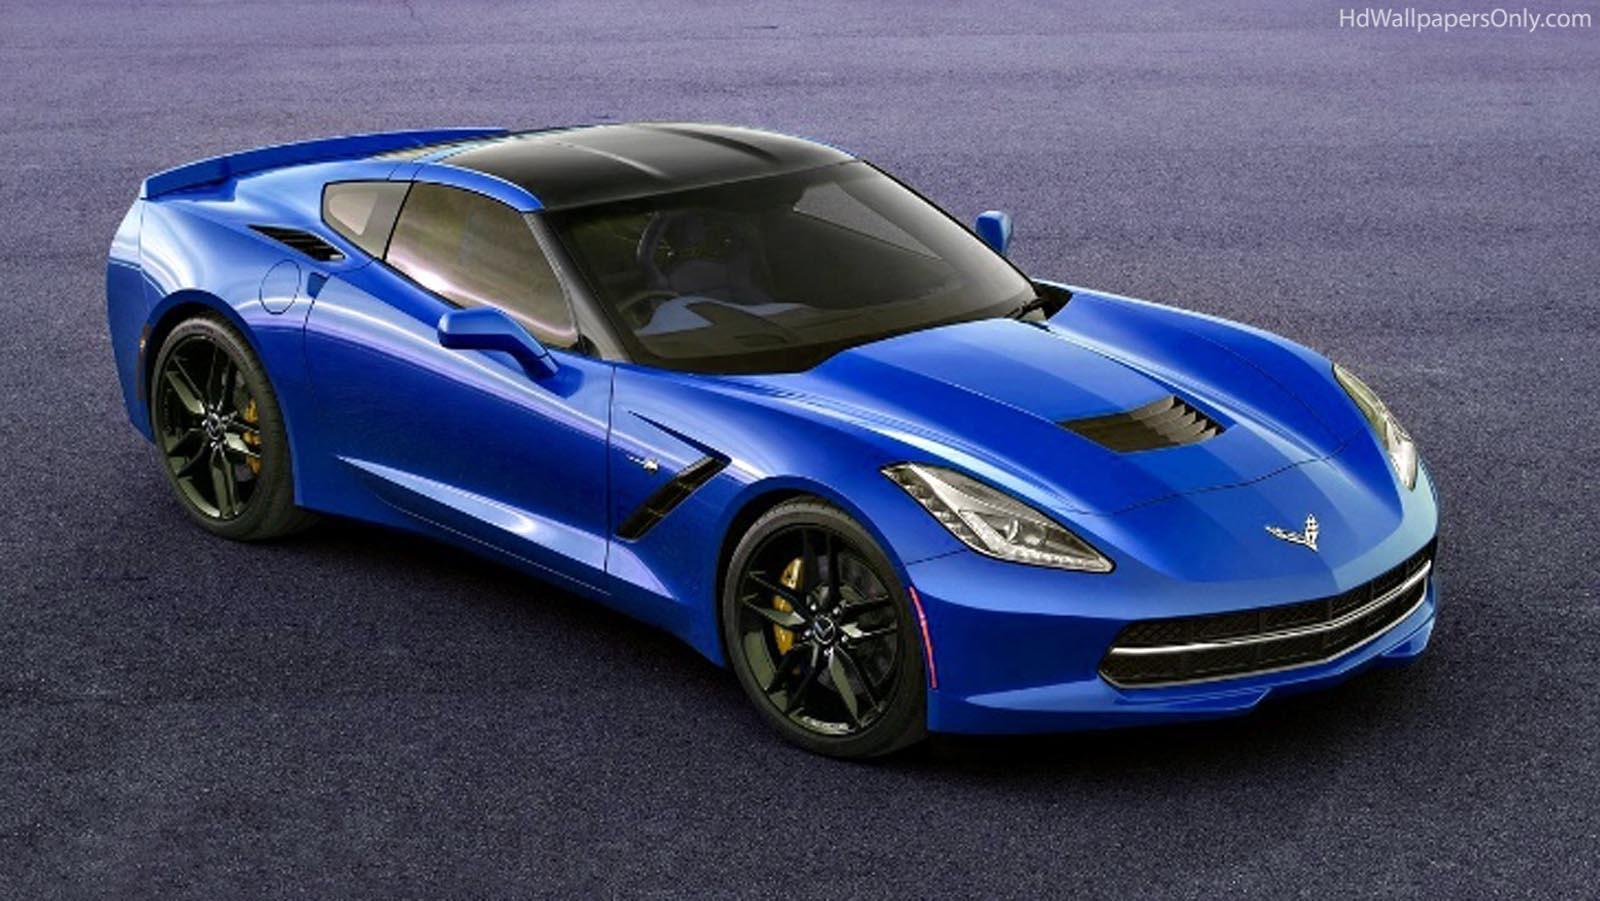 2014 Corvette C7 5537 Hd Wallpapers in Cars   Imagescicom 1600x901